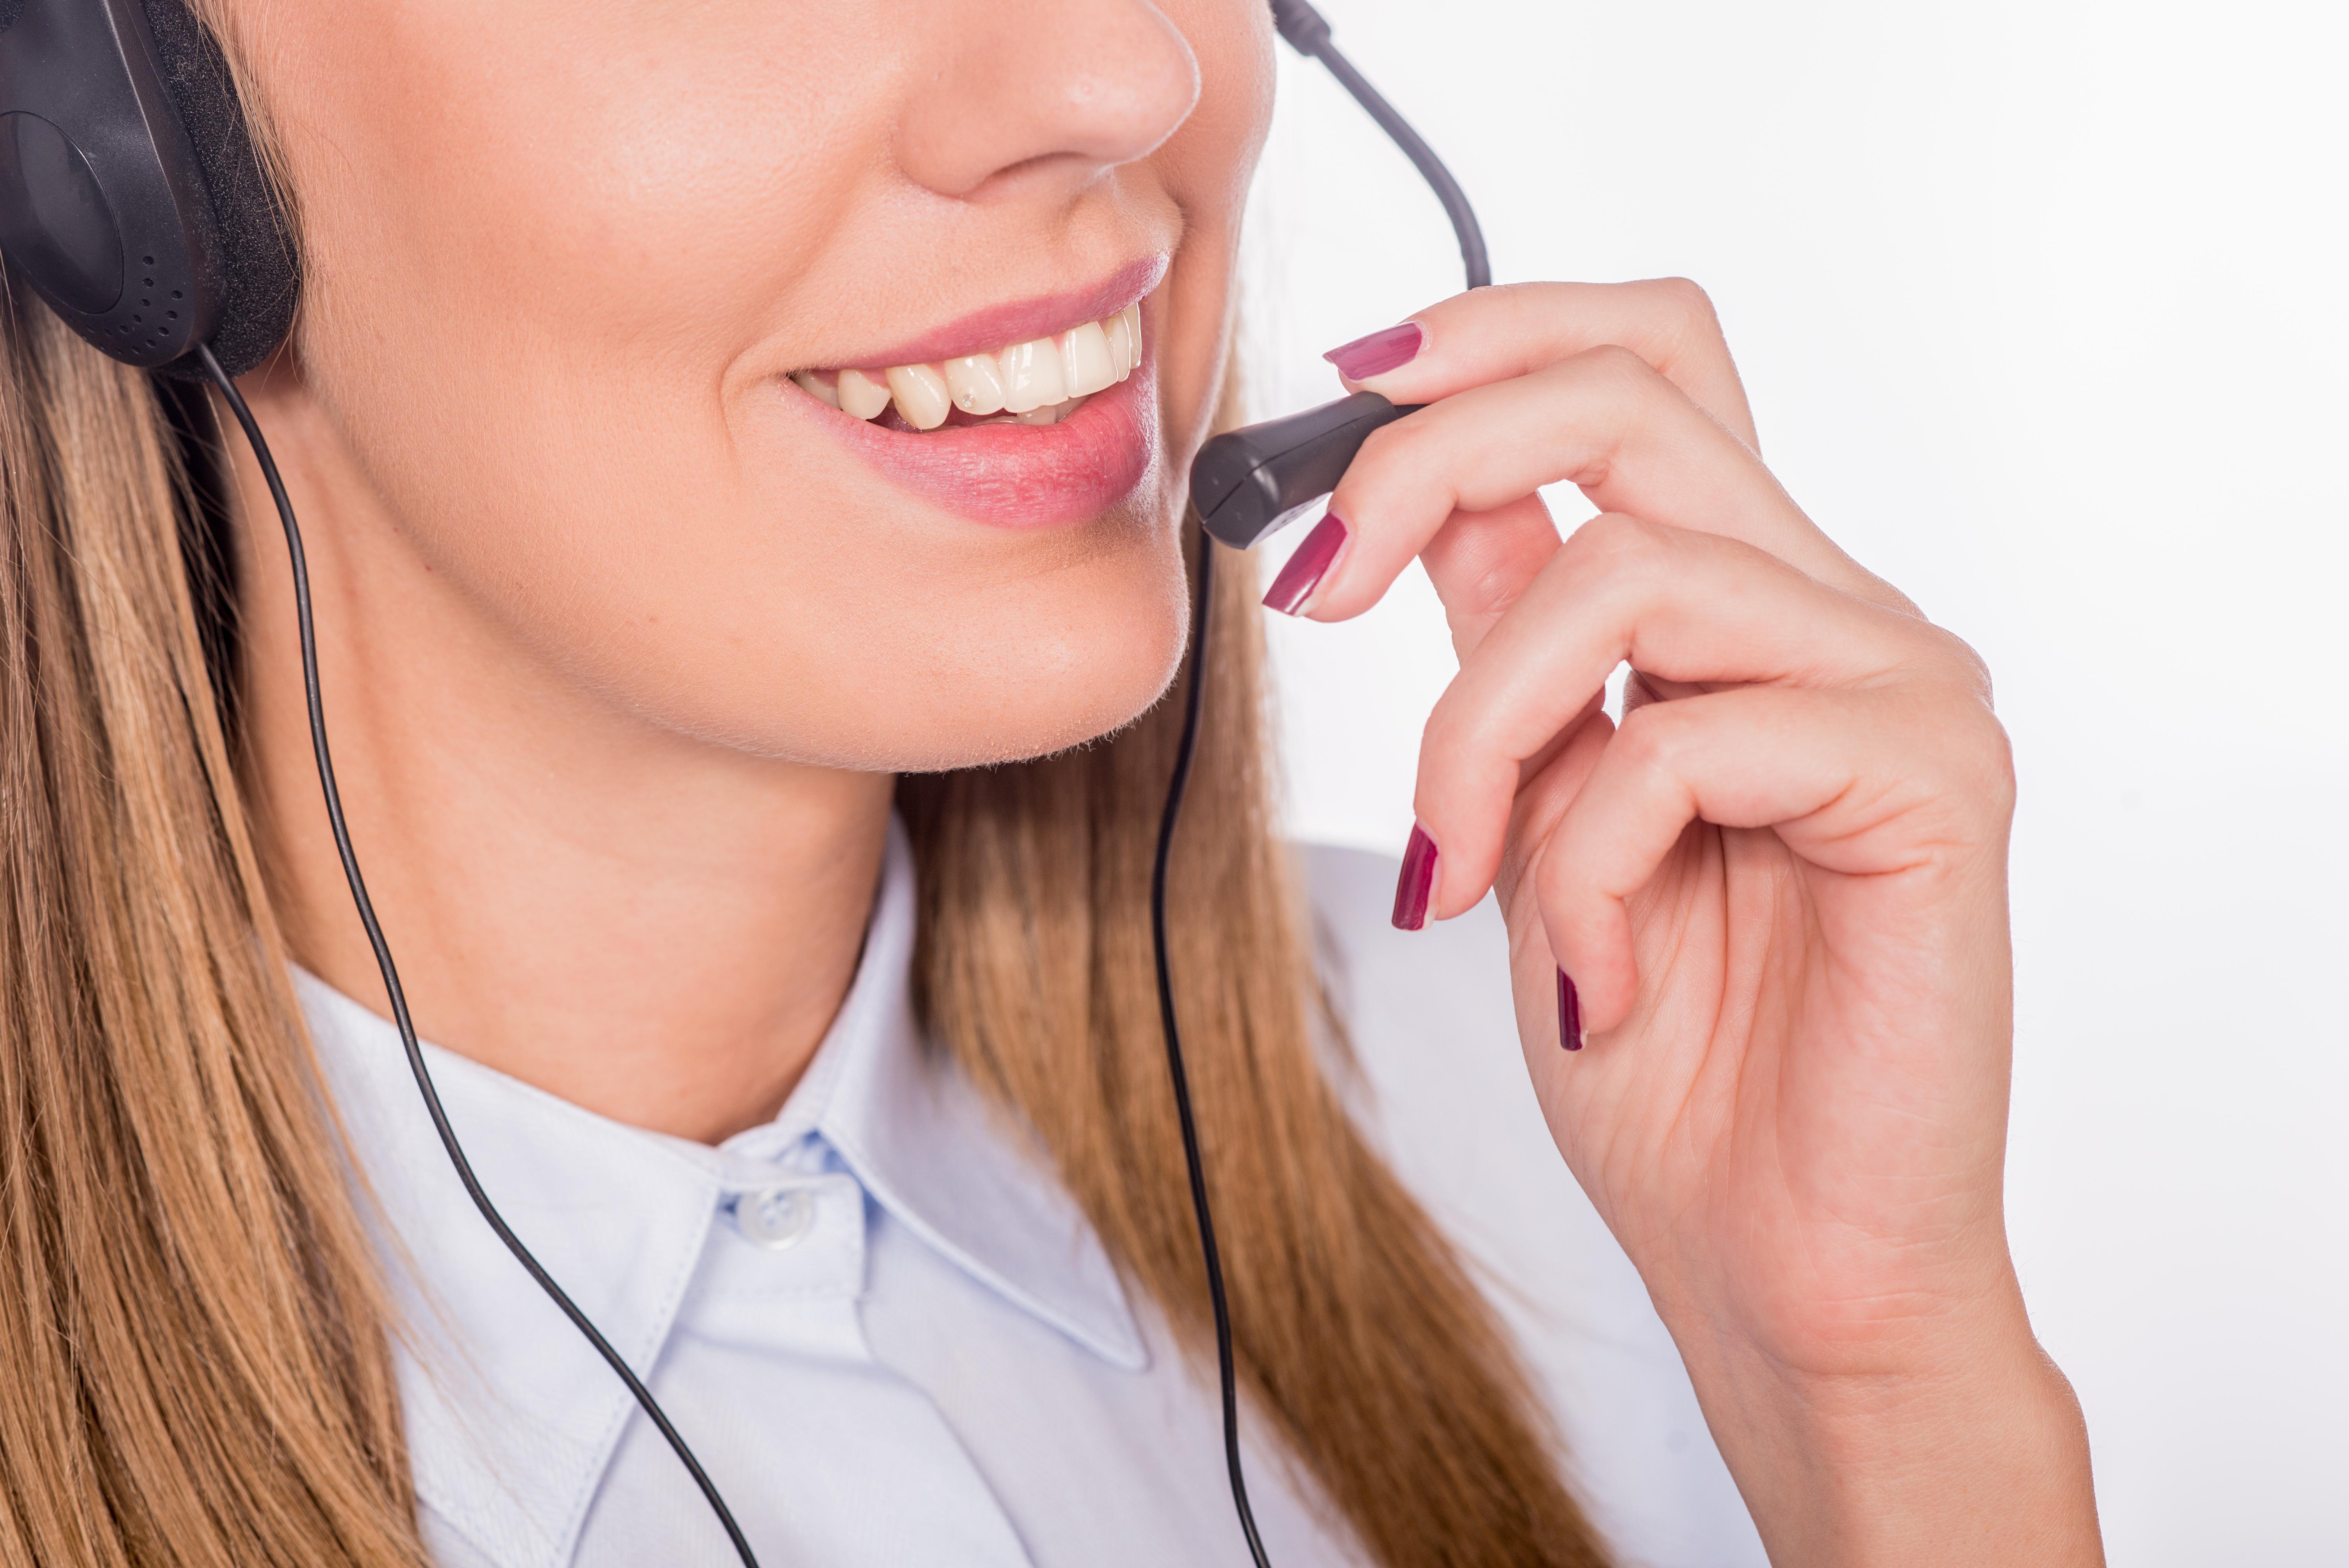 Programa Call Center- Línea COVID-19 (443736)